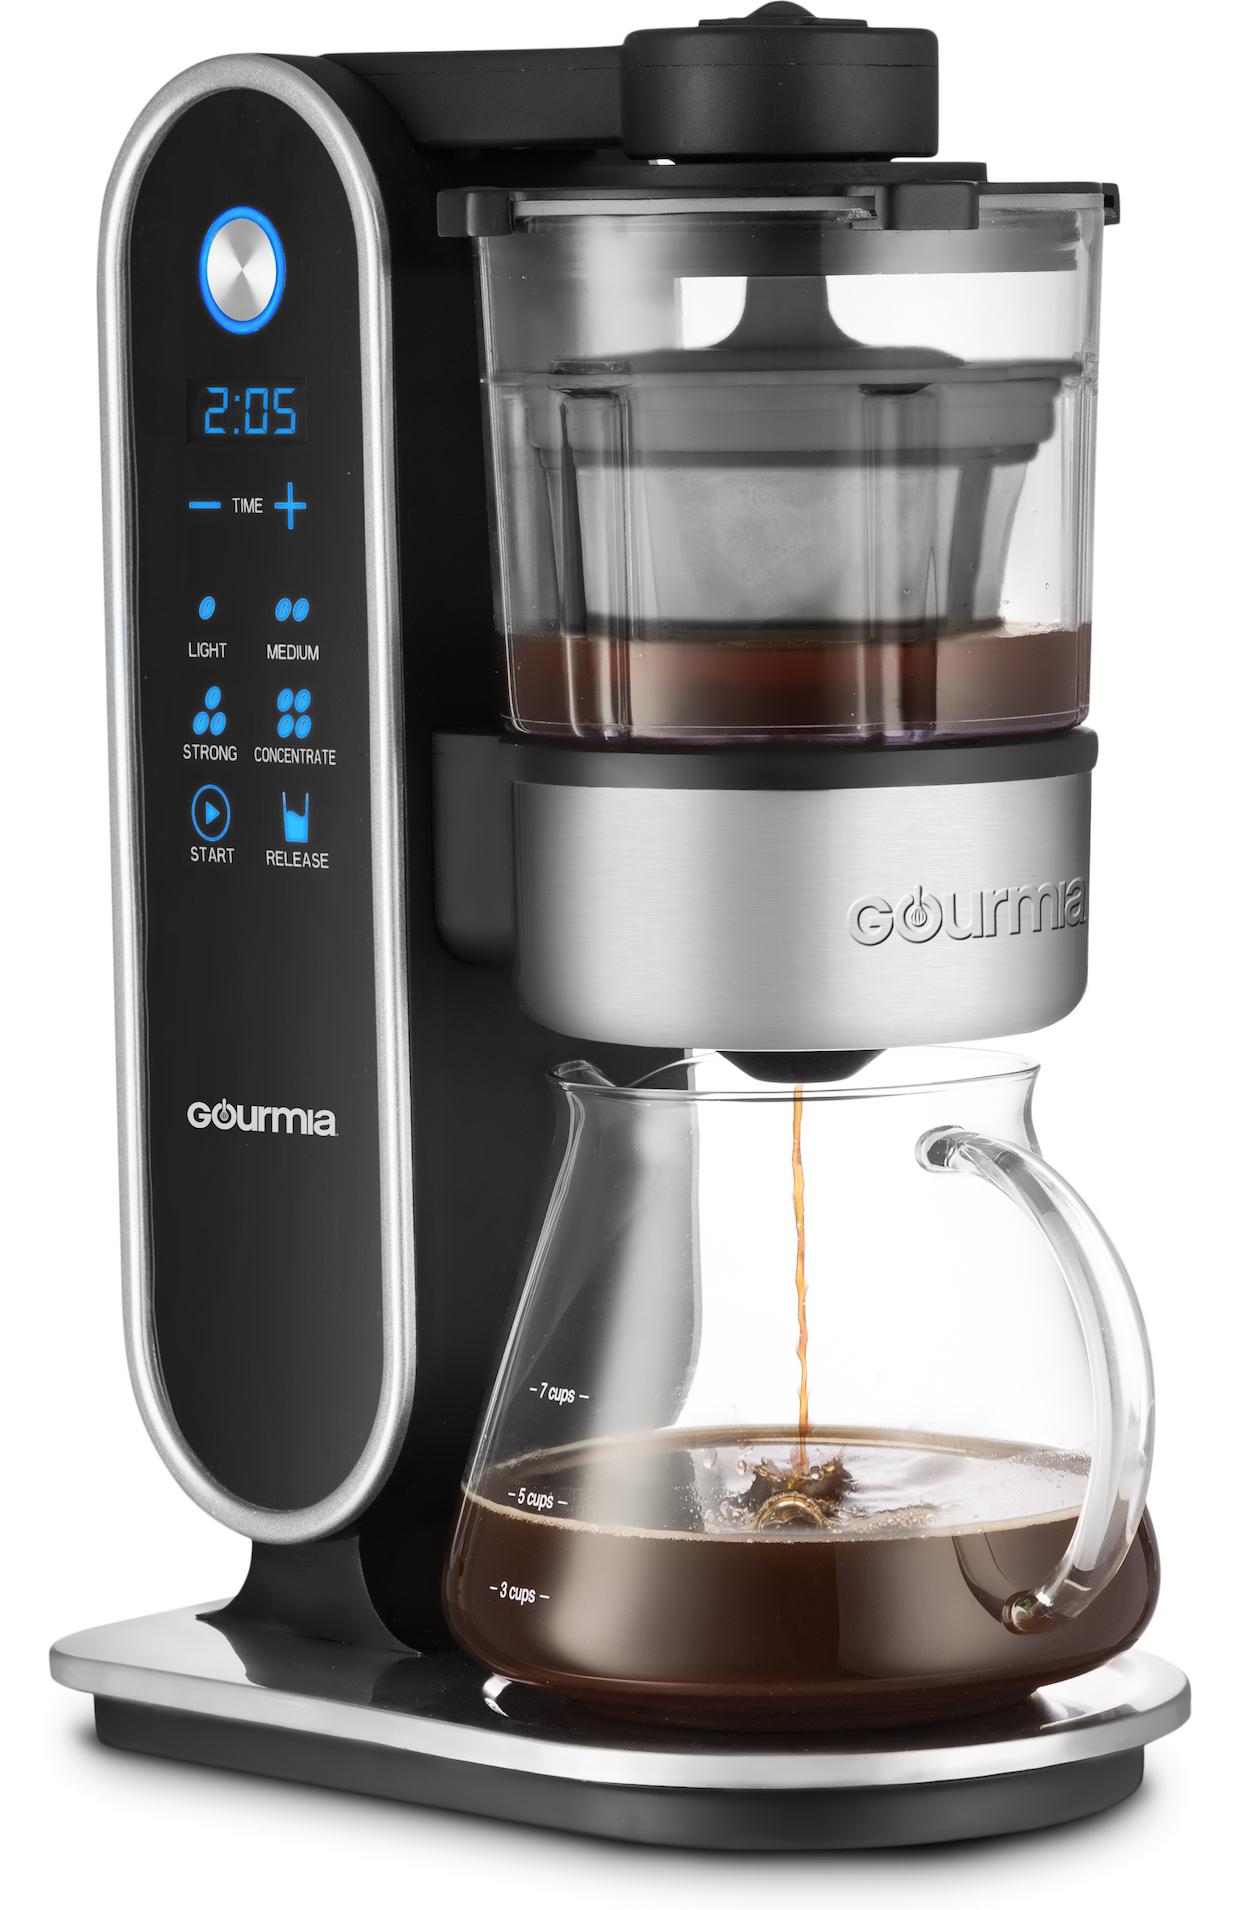 Gourmia coffee home brewing